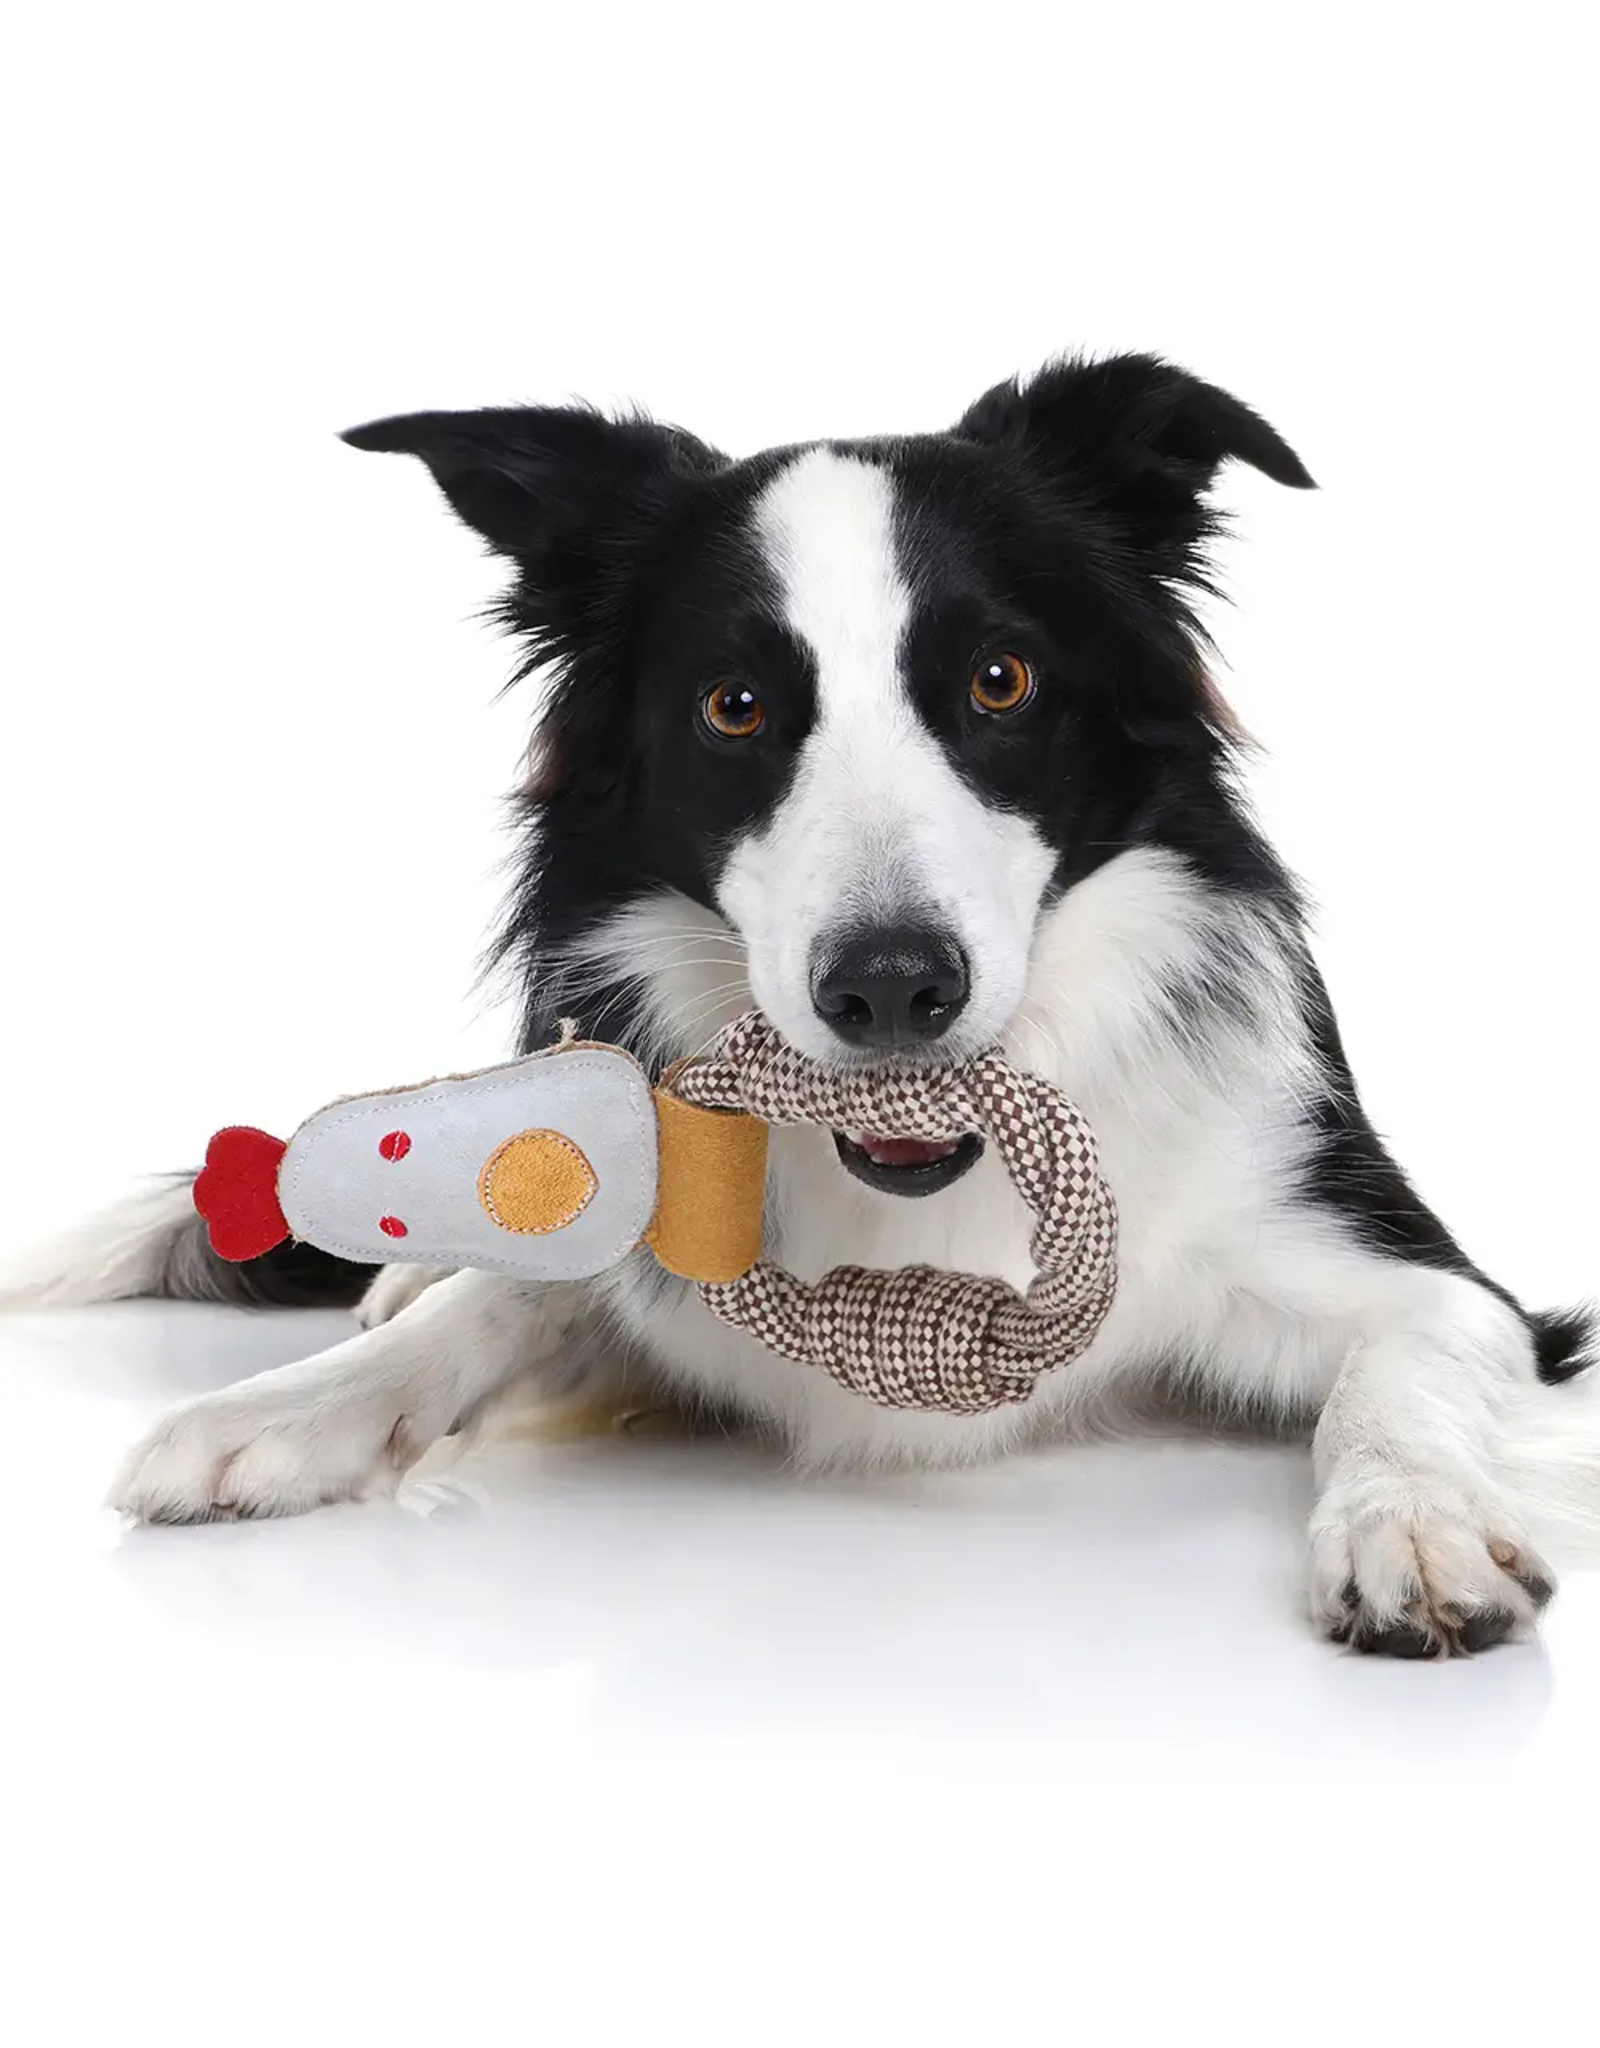 Rope Dog Toy - Pig